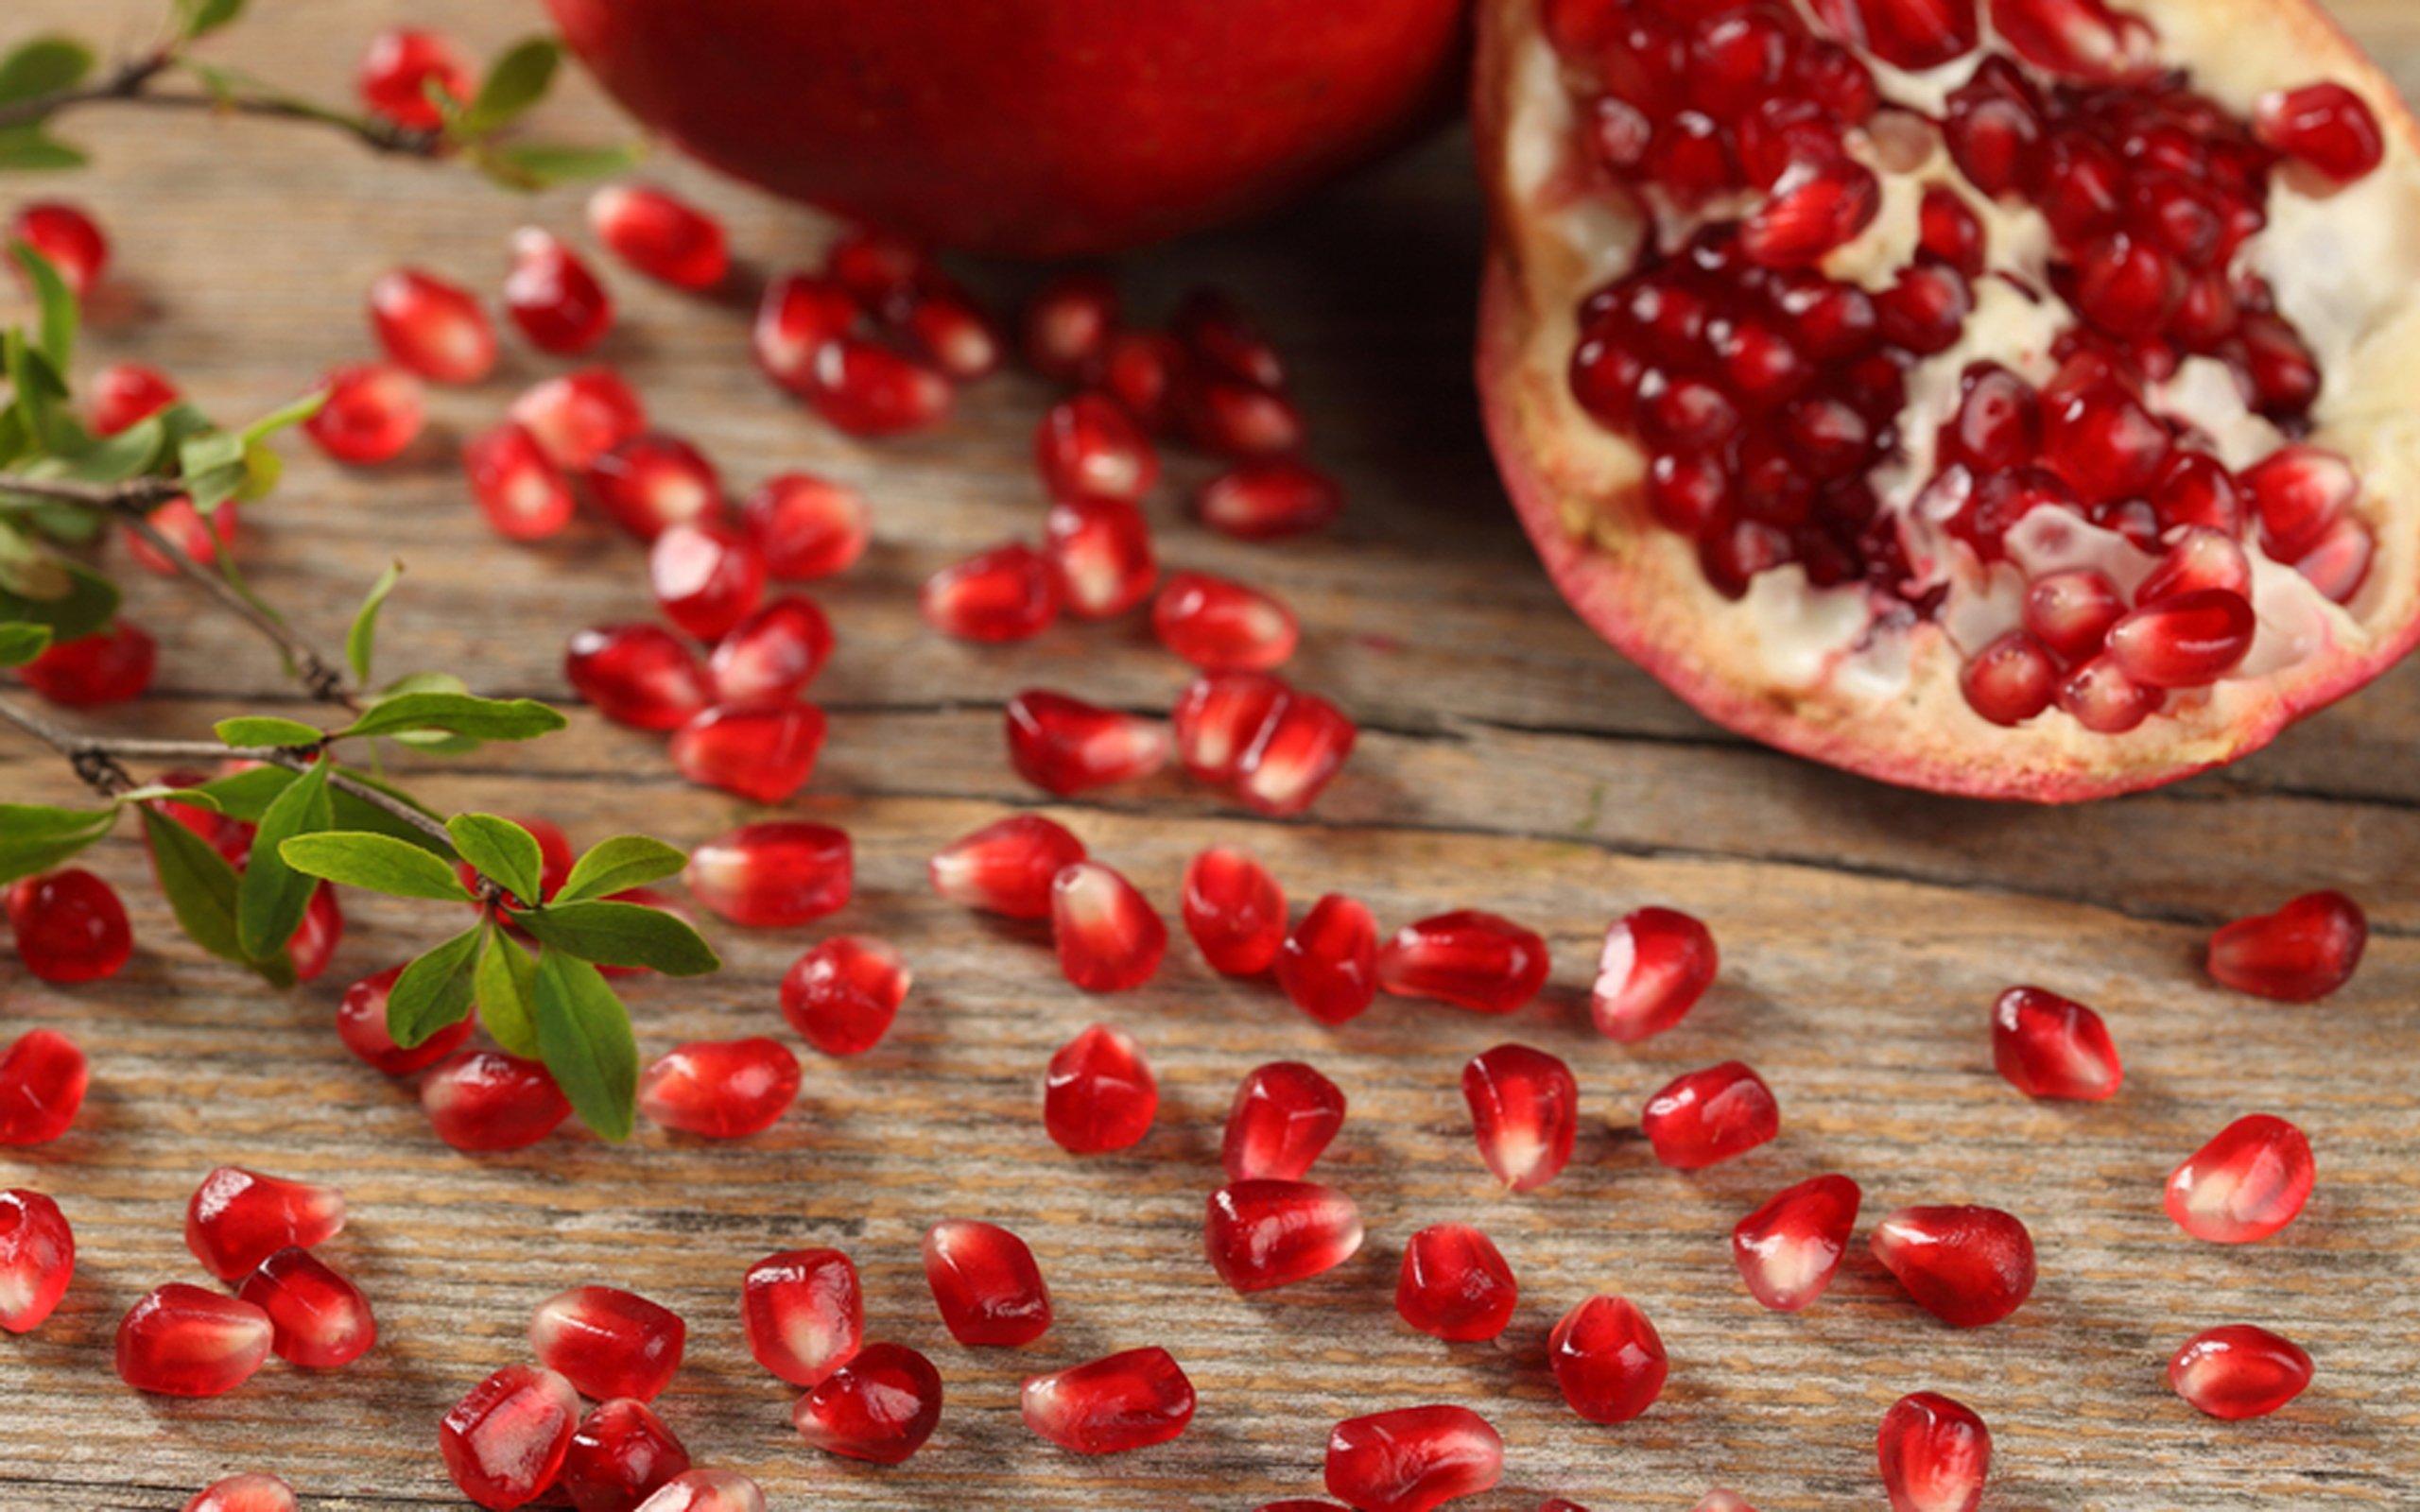 Wonderful Fruit Wallpaper 45622